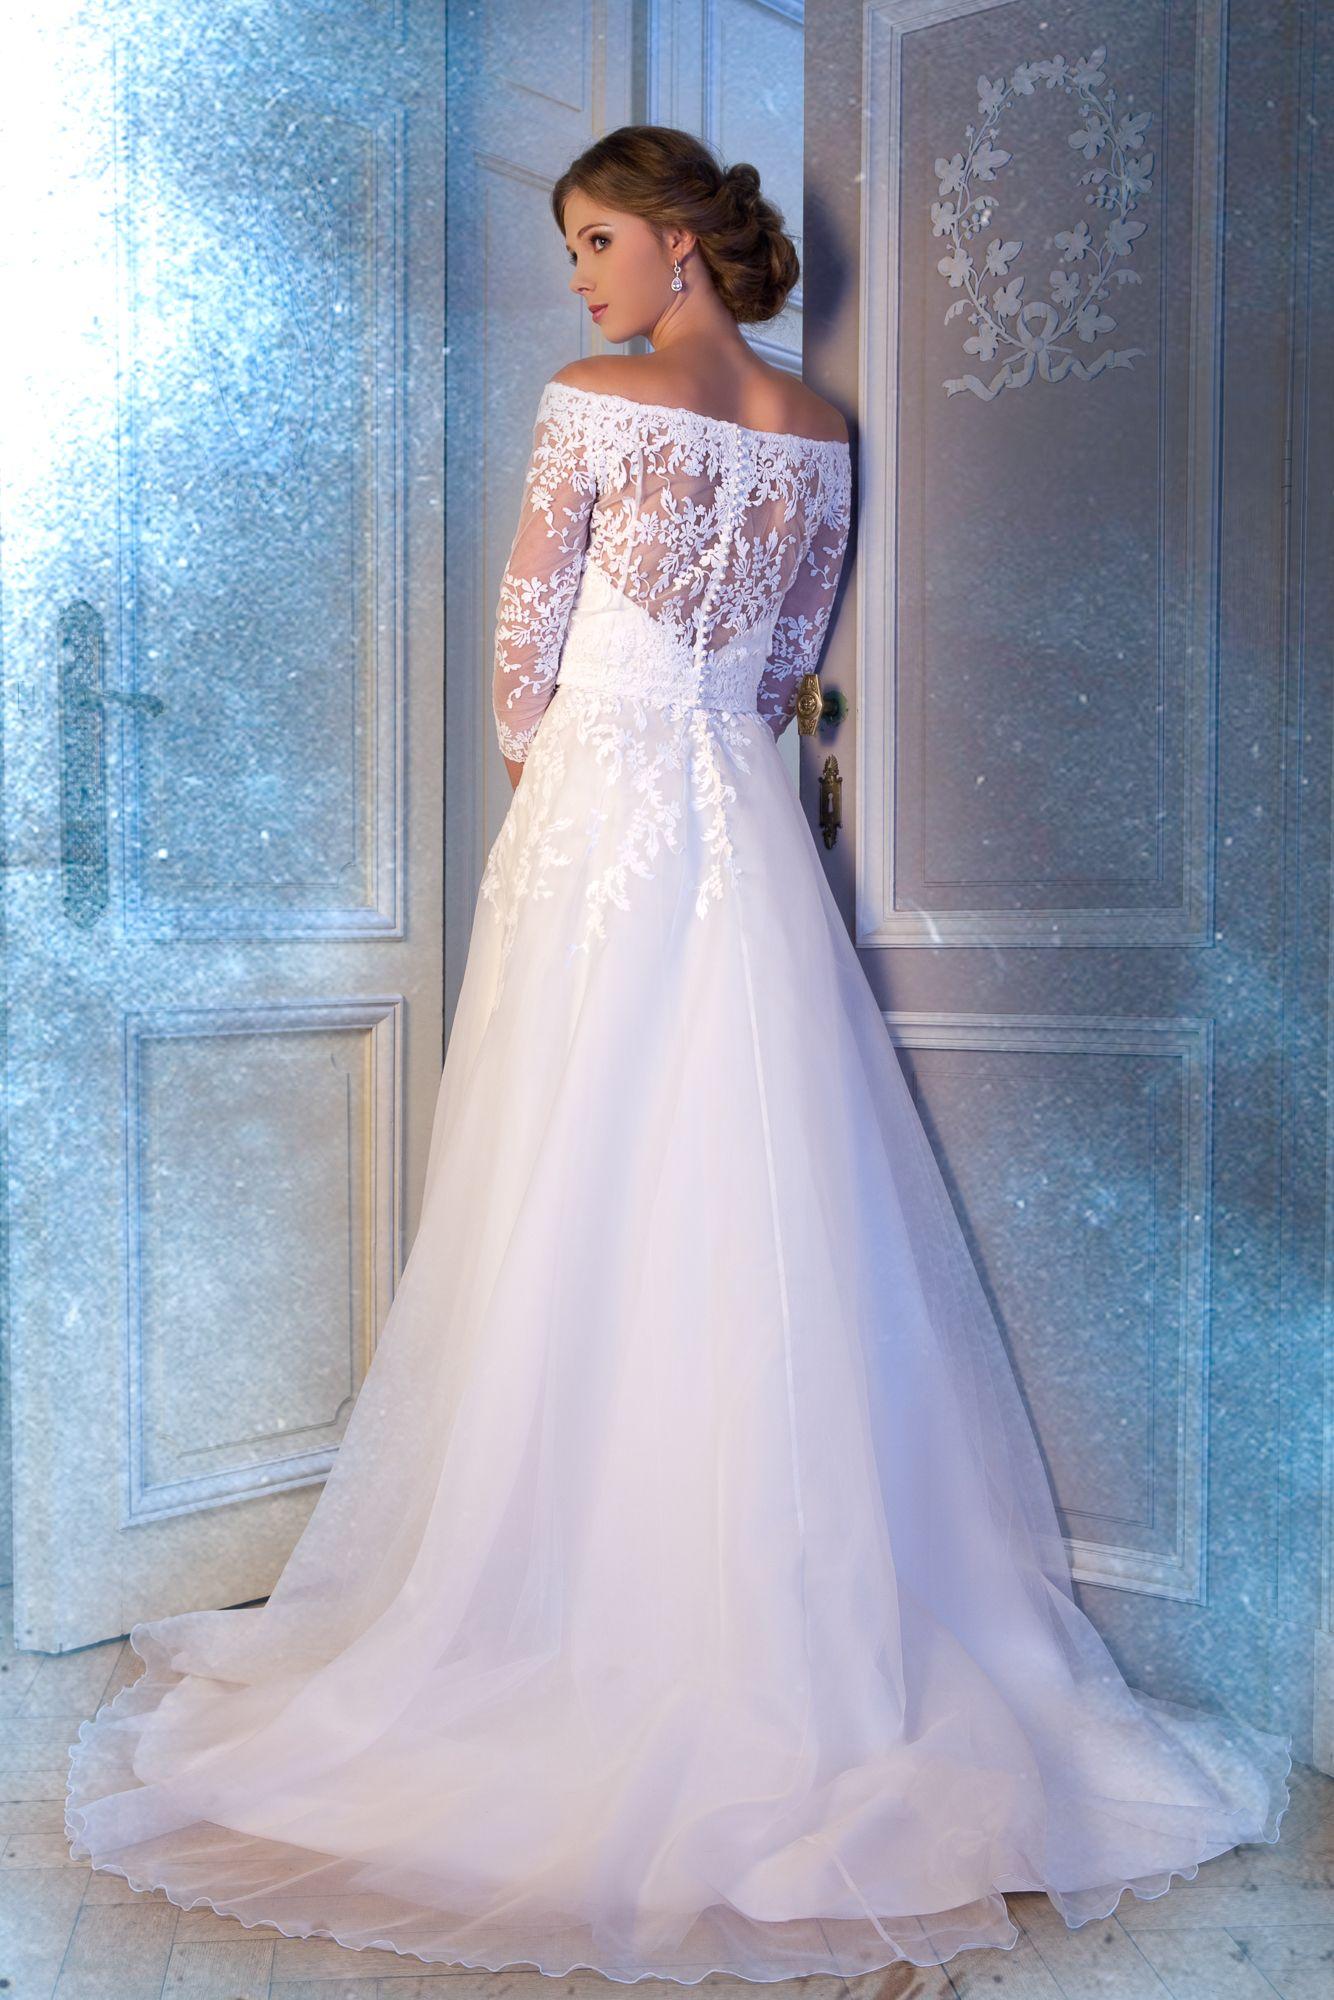 charline verbeken styliste haute couture robe de mari e. Black Bedroom Furniture Sets. Home Design Ideas